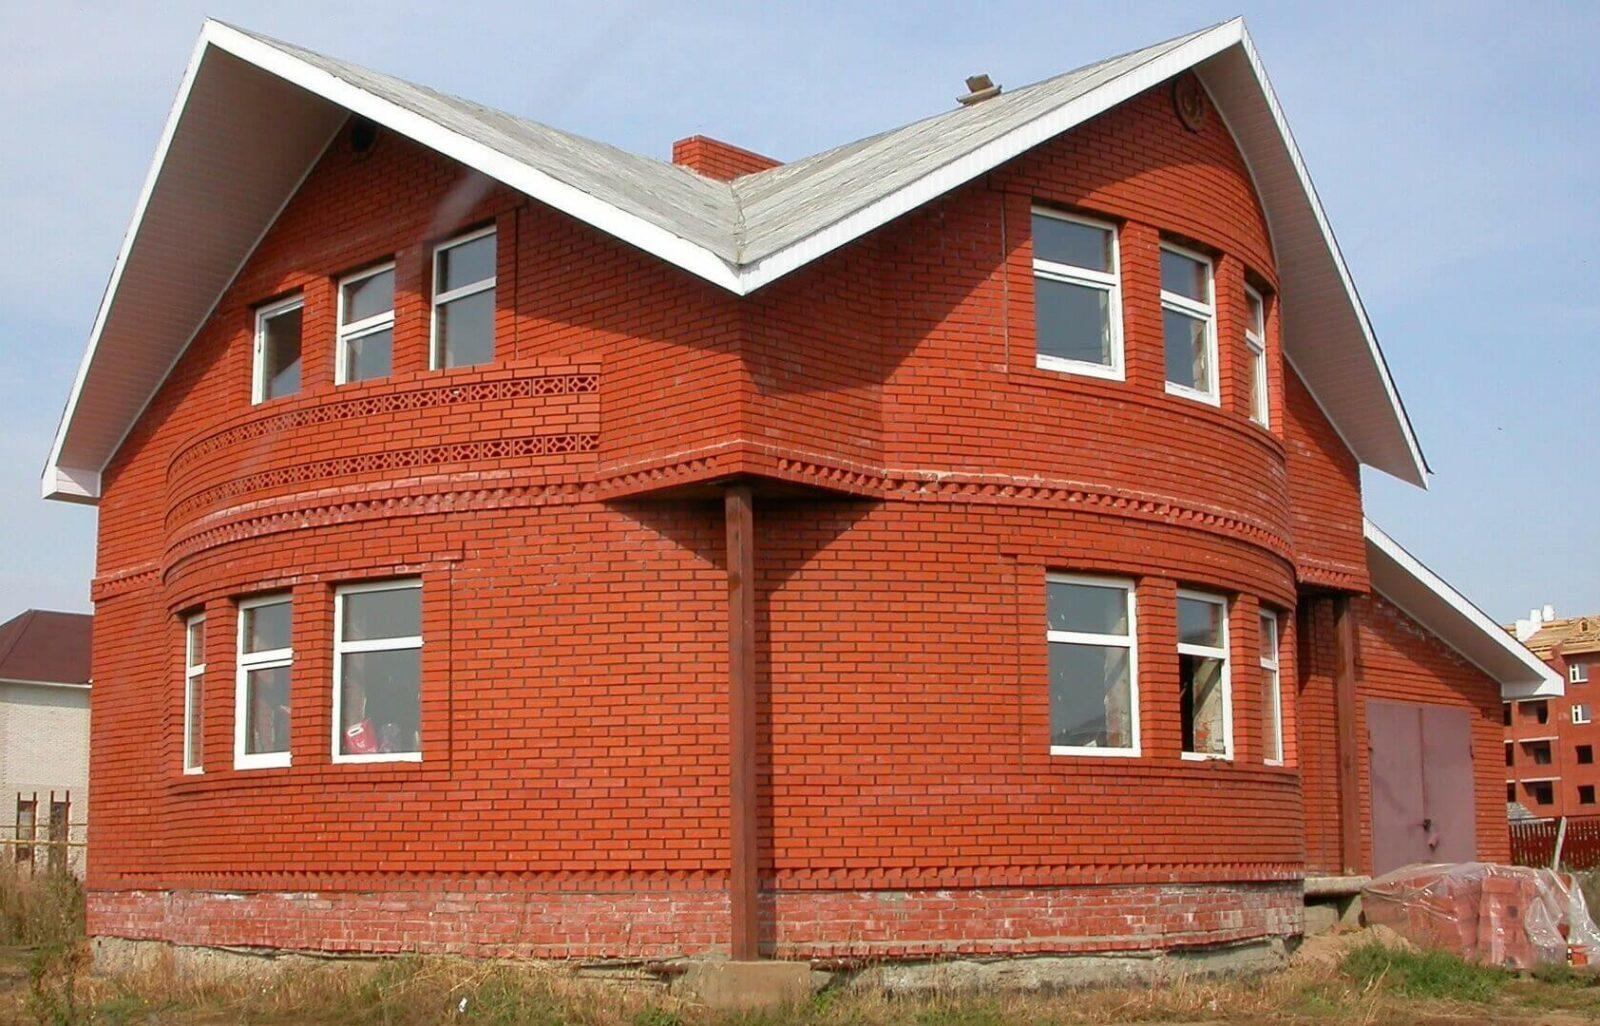 Авангард - строительство домов